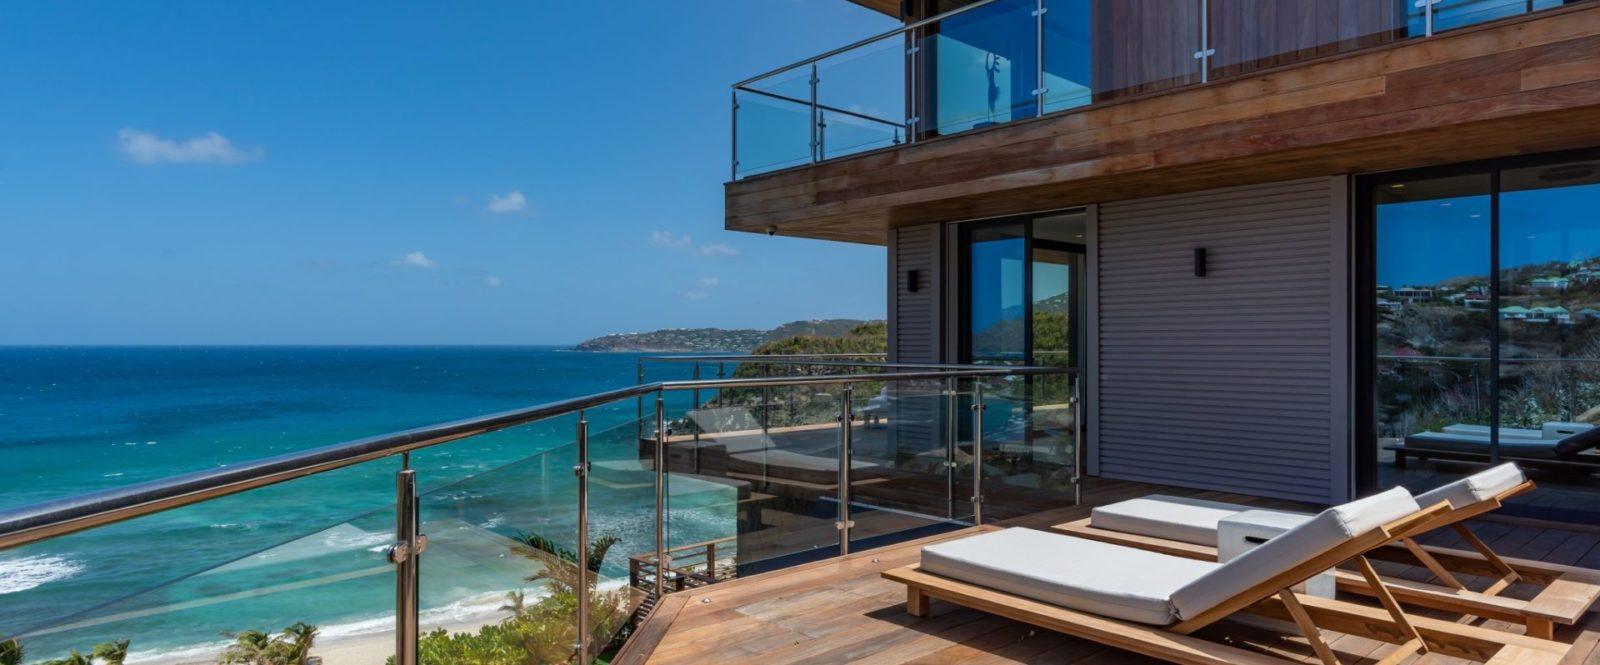 LITAL - villa-lital-terrasse-ch-2-etage-sup-salon-2